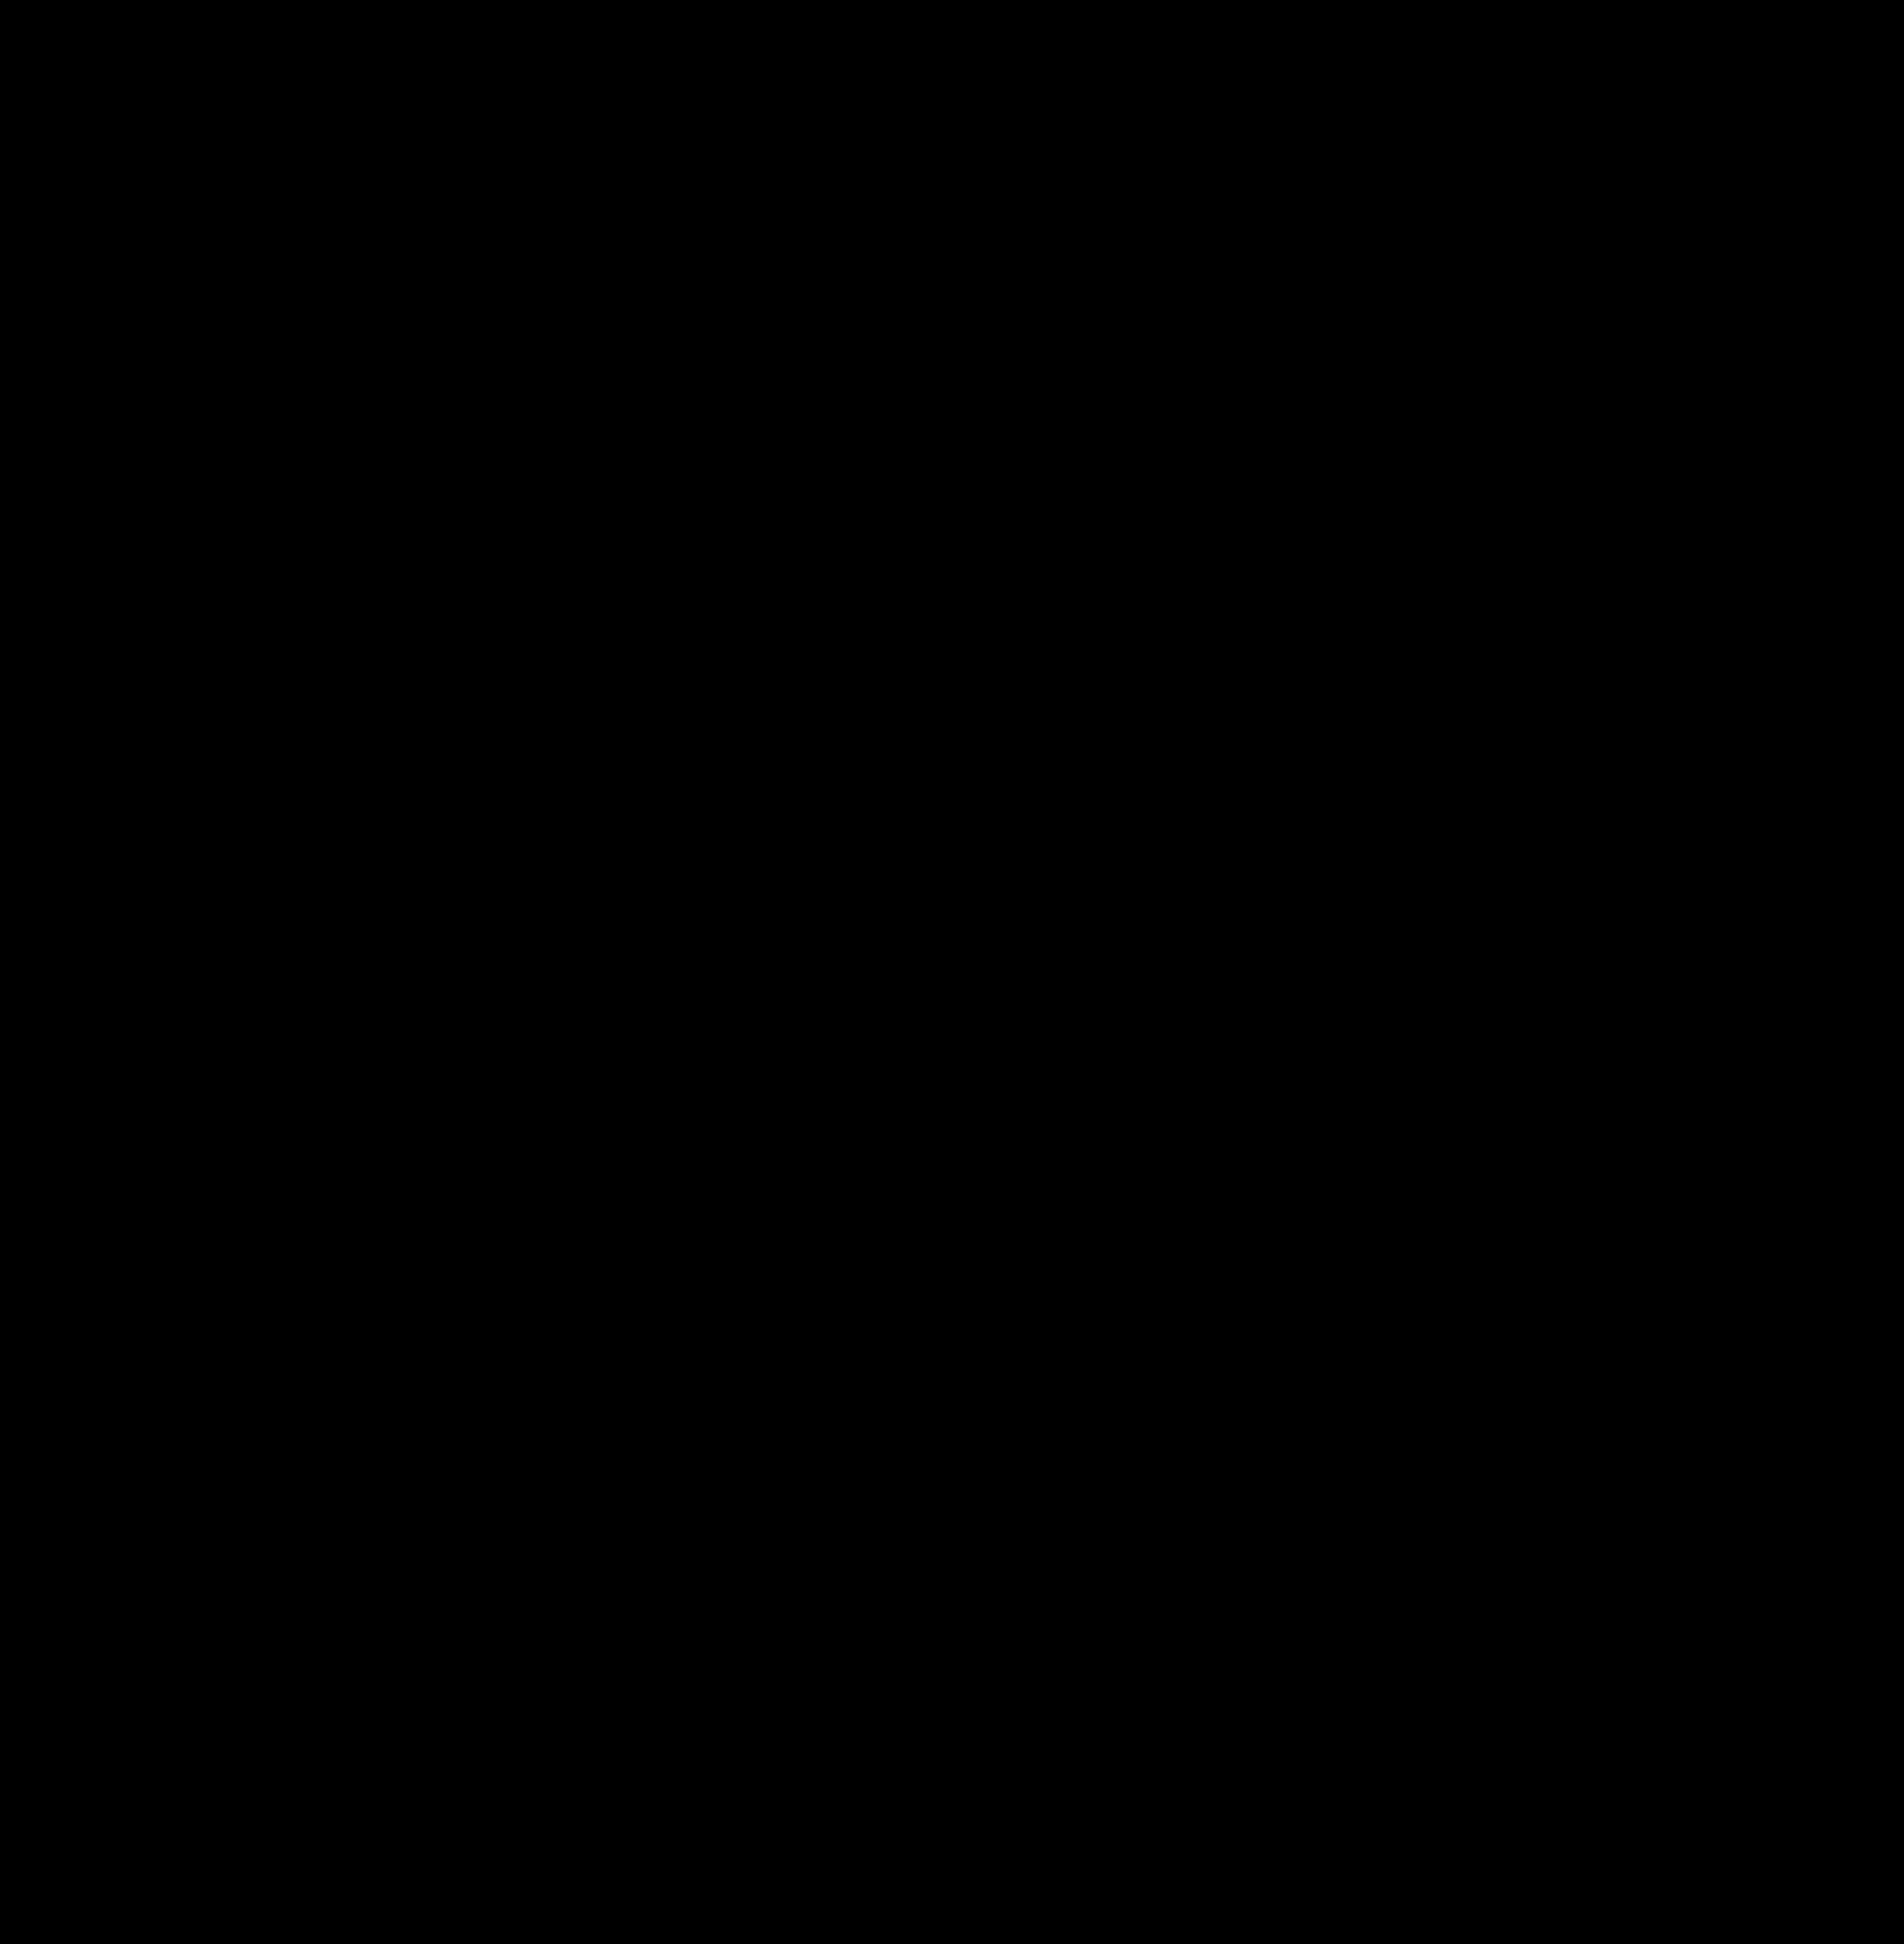 Oreo clipart silhouette. Fishing boy big image